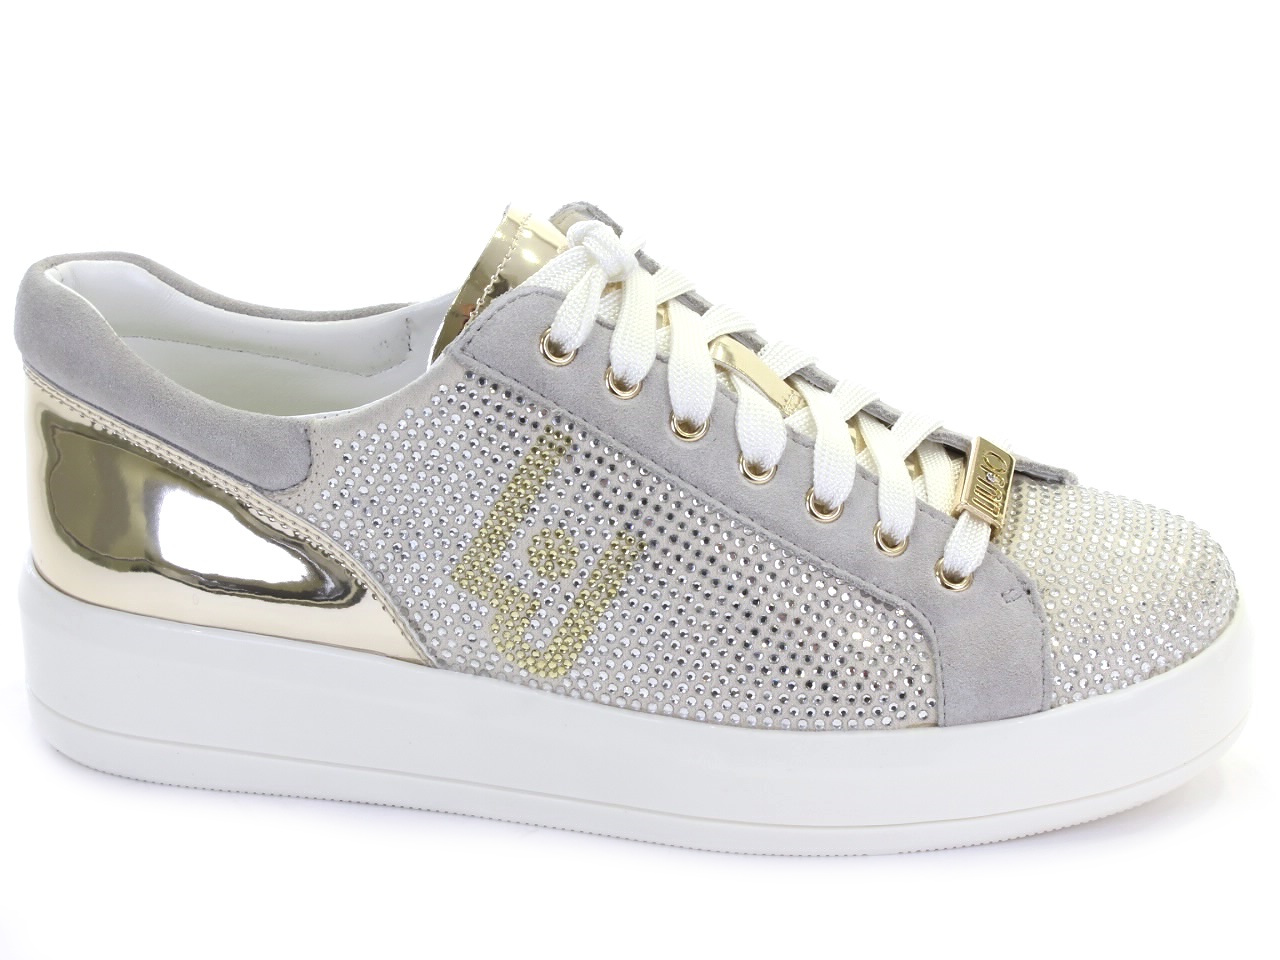 Sneakers and Espadrilles Liu Jo - 672 B18019T2030